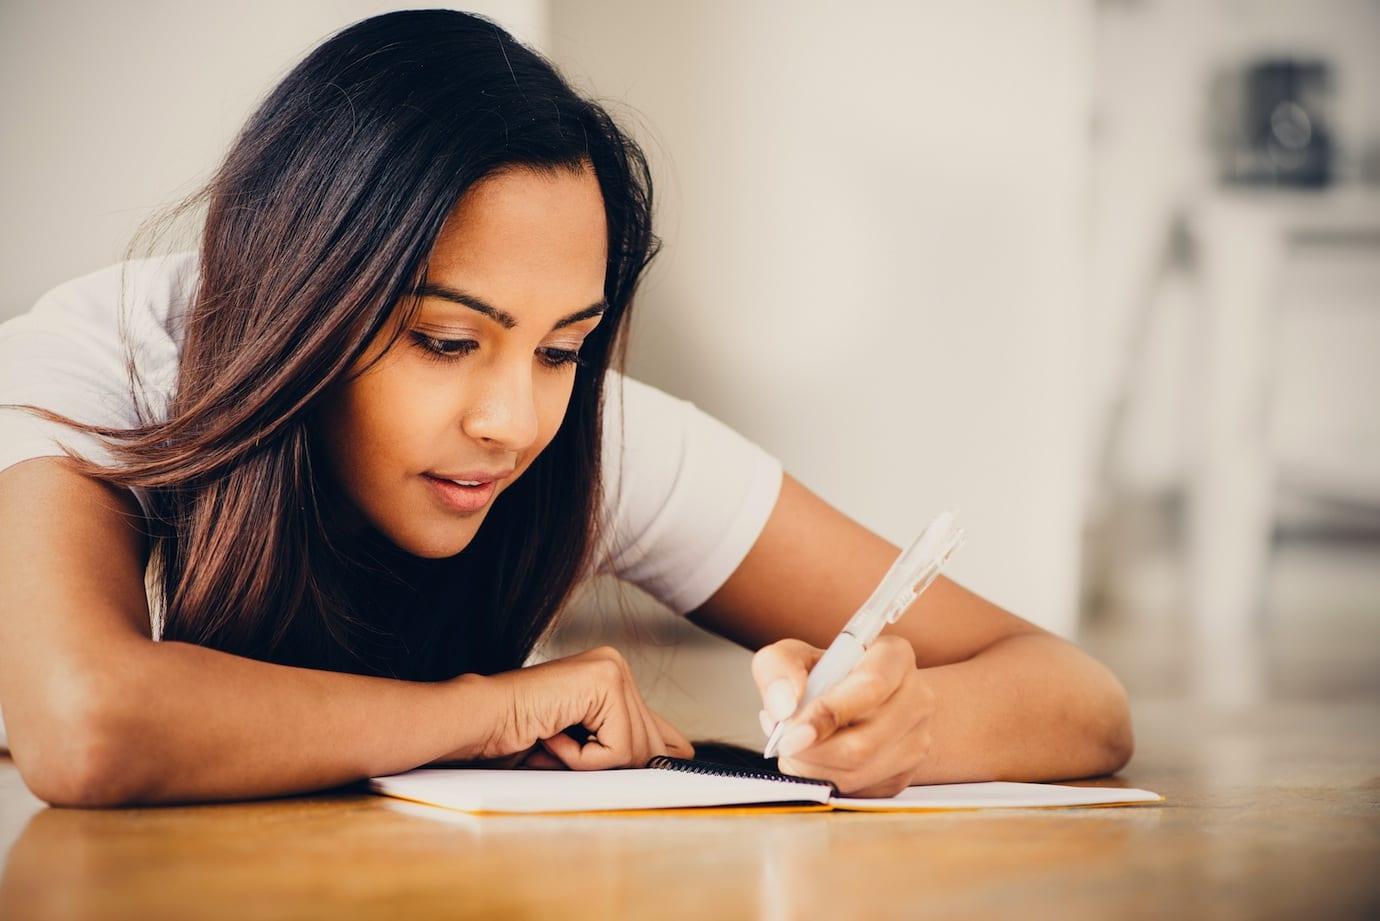 Sexy girl is writing